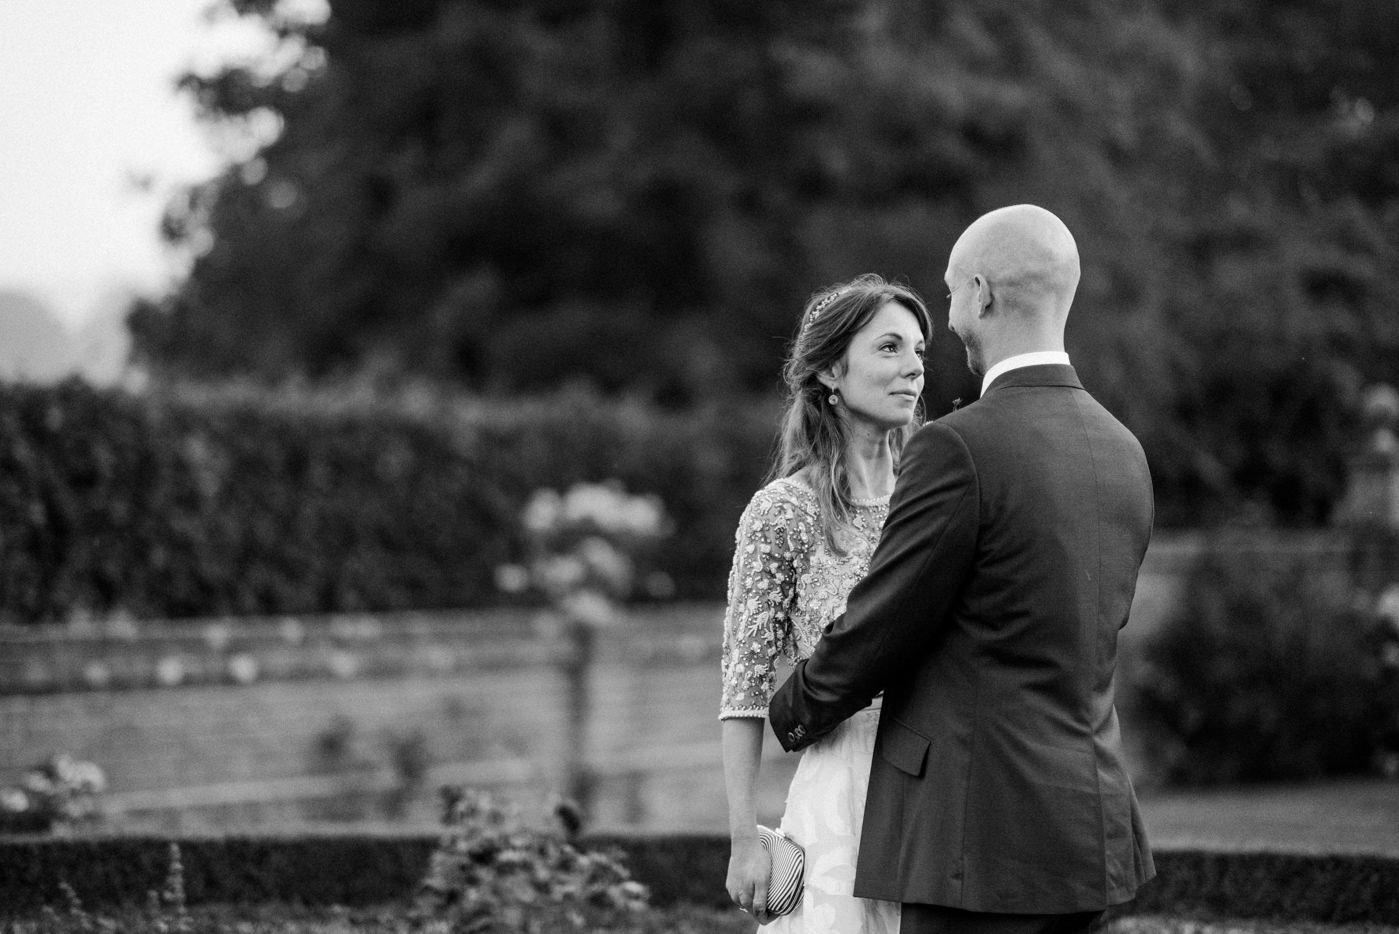 bignor-park-wedding-photography-robyn-and-tom-109